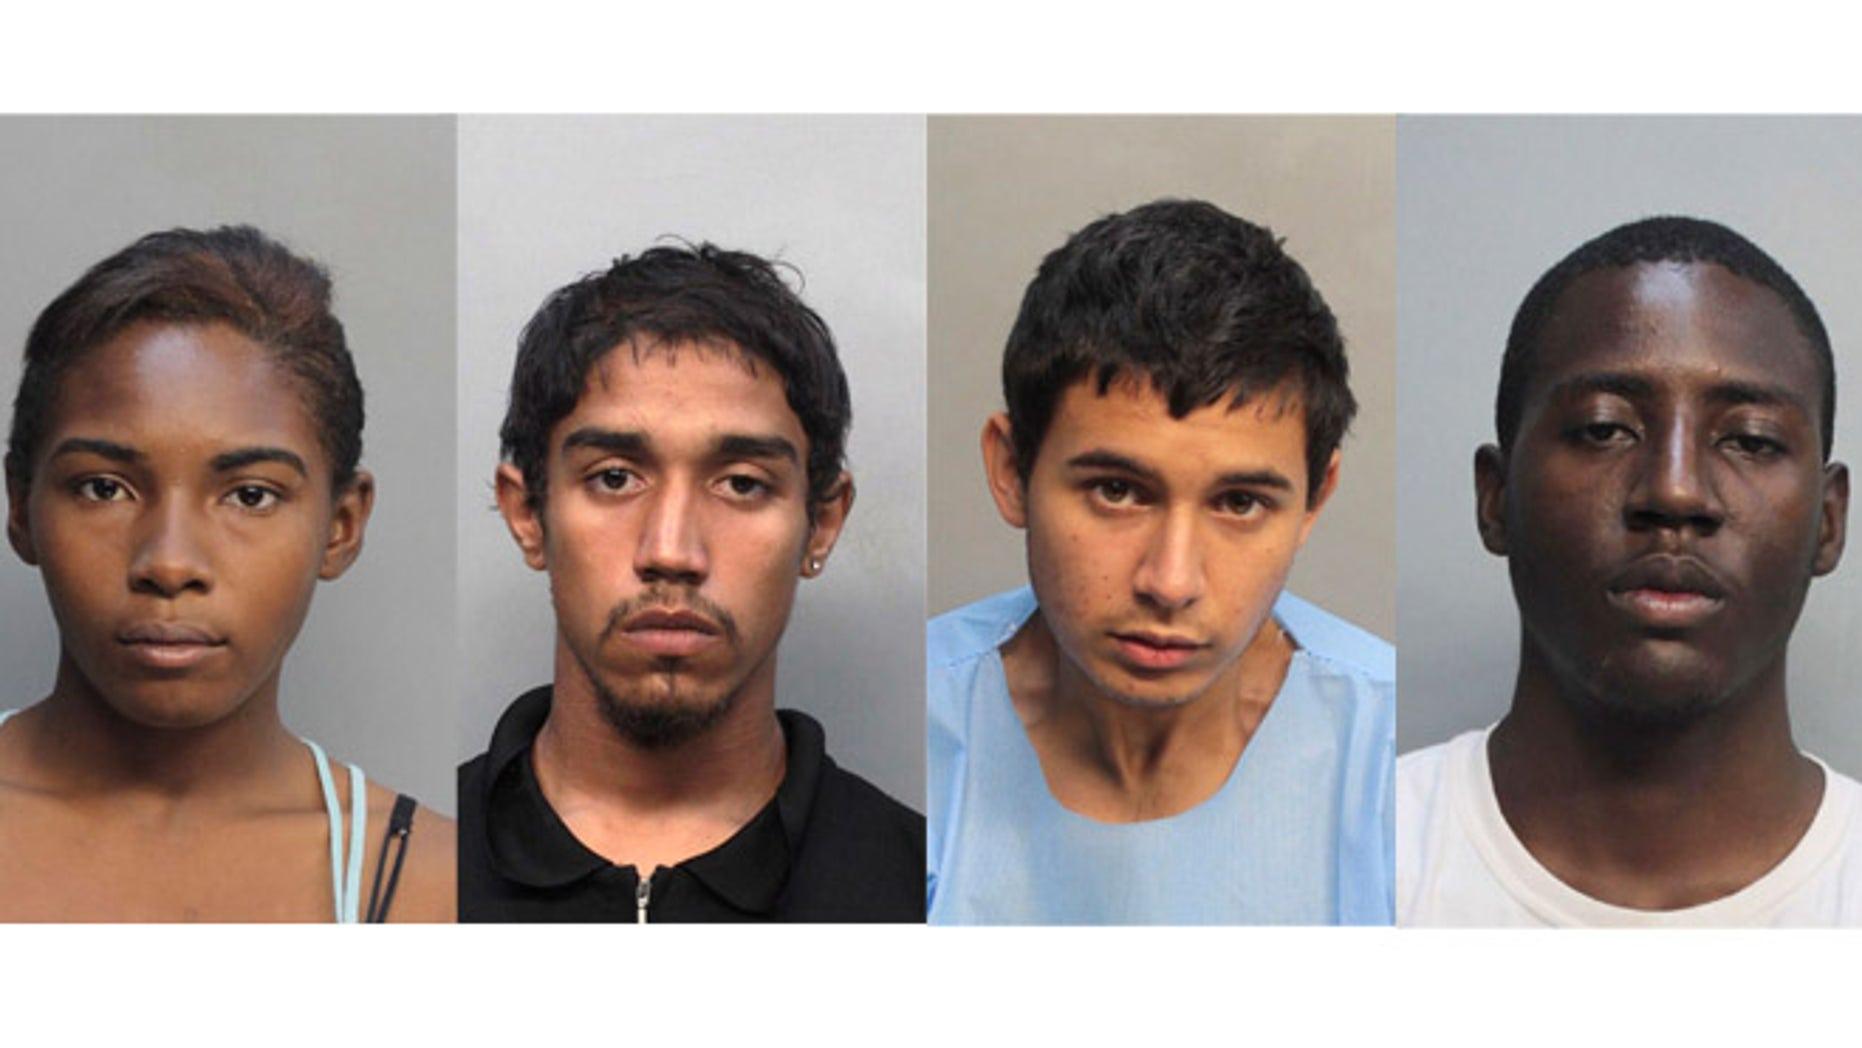 Desiray Strickland, Kaheem Arbelo, Christian Colon and Jonathan Lucas. (Photos: Associated Press)